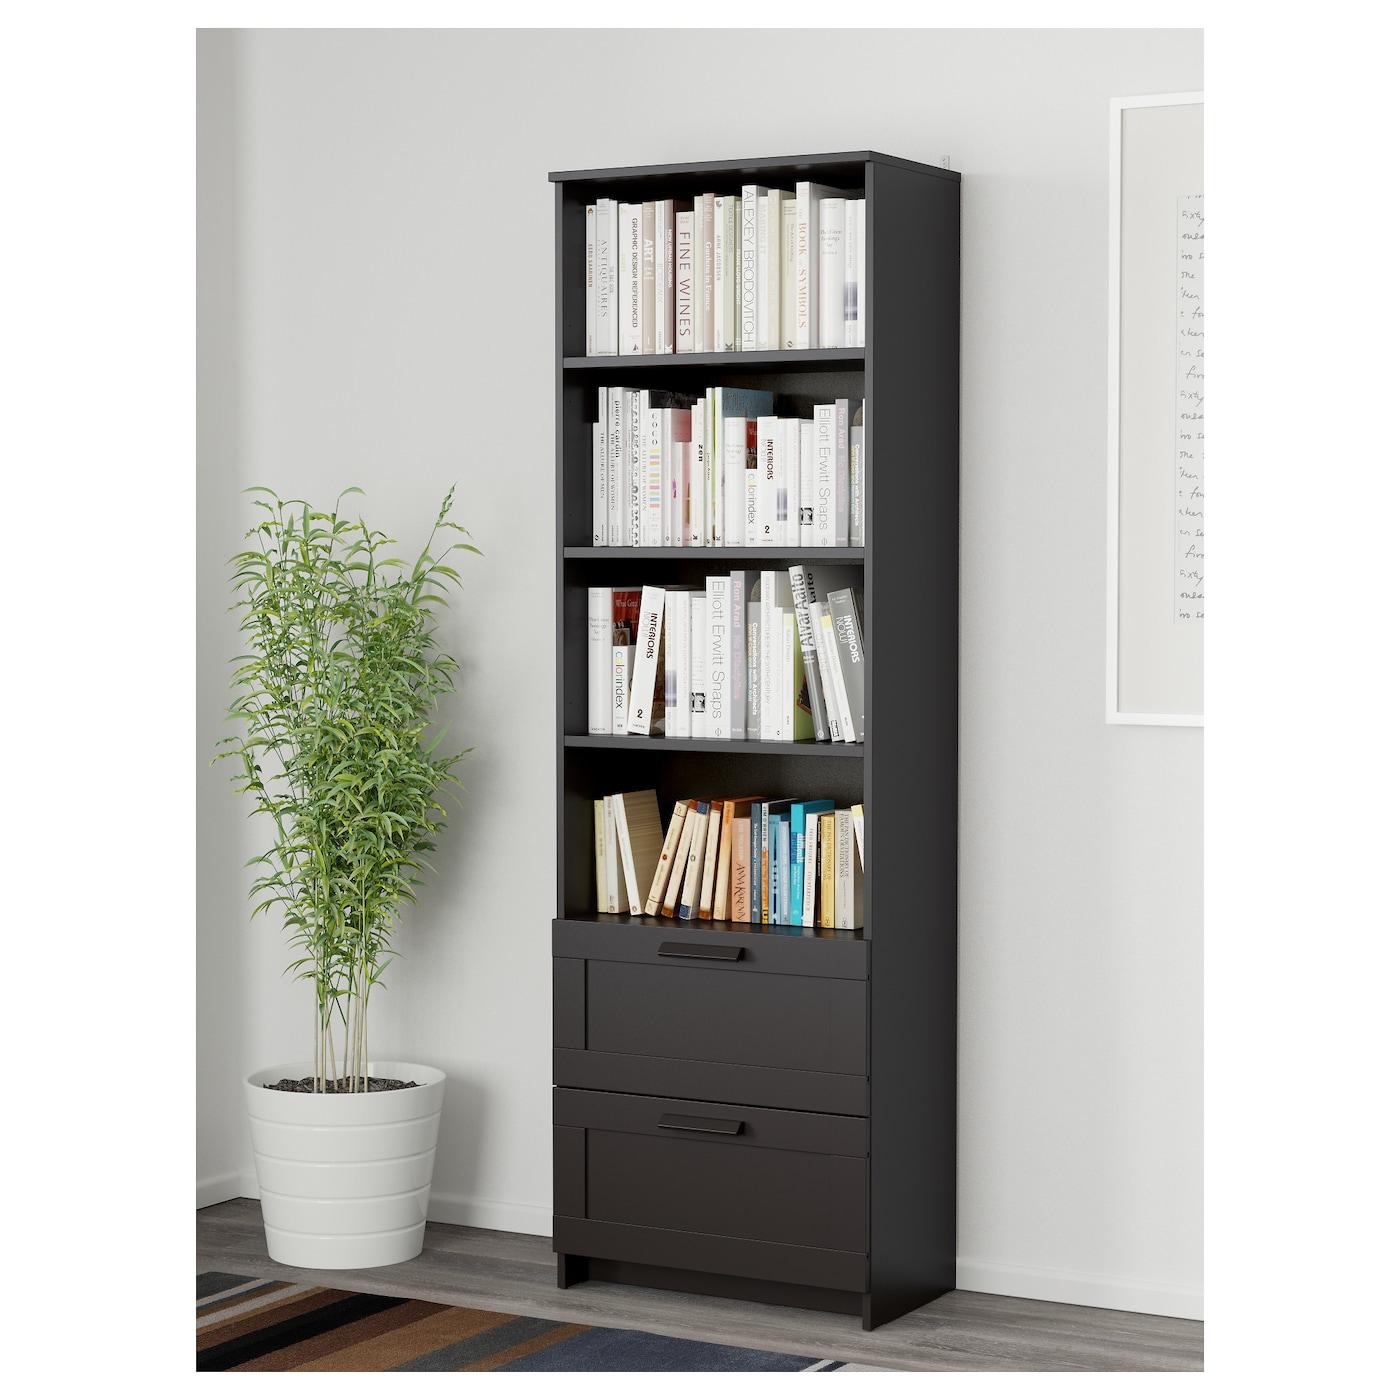 BRIMNES Bookcase Black 60x190 cm IKEA